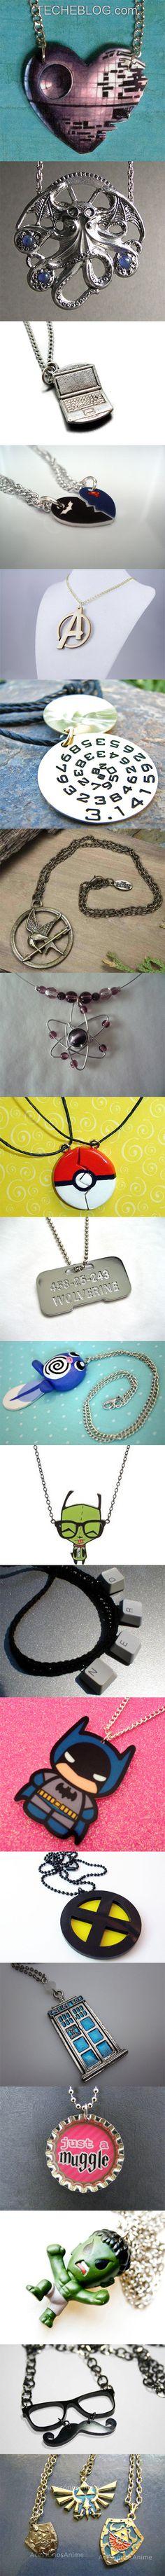 Geek jewelry.